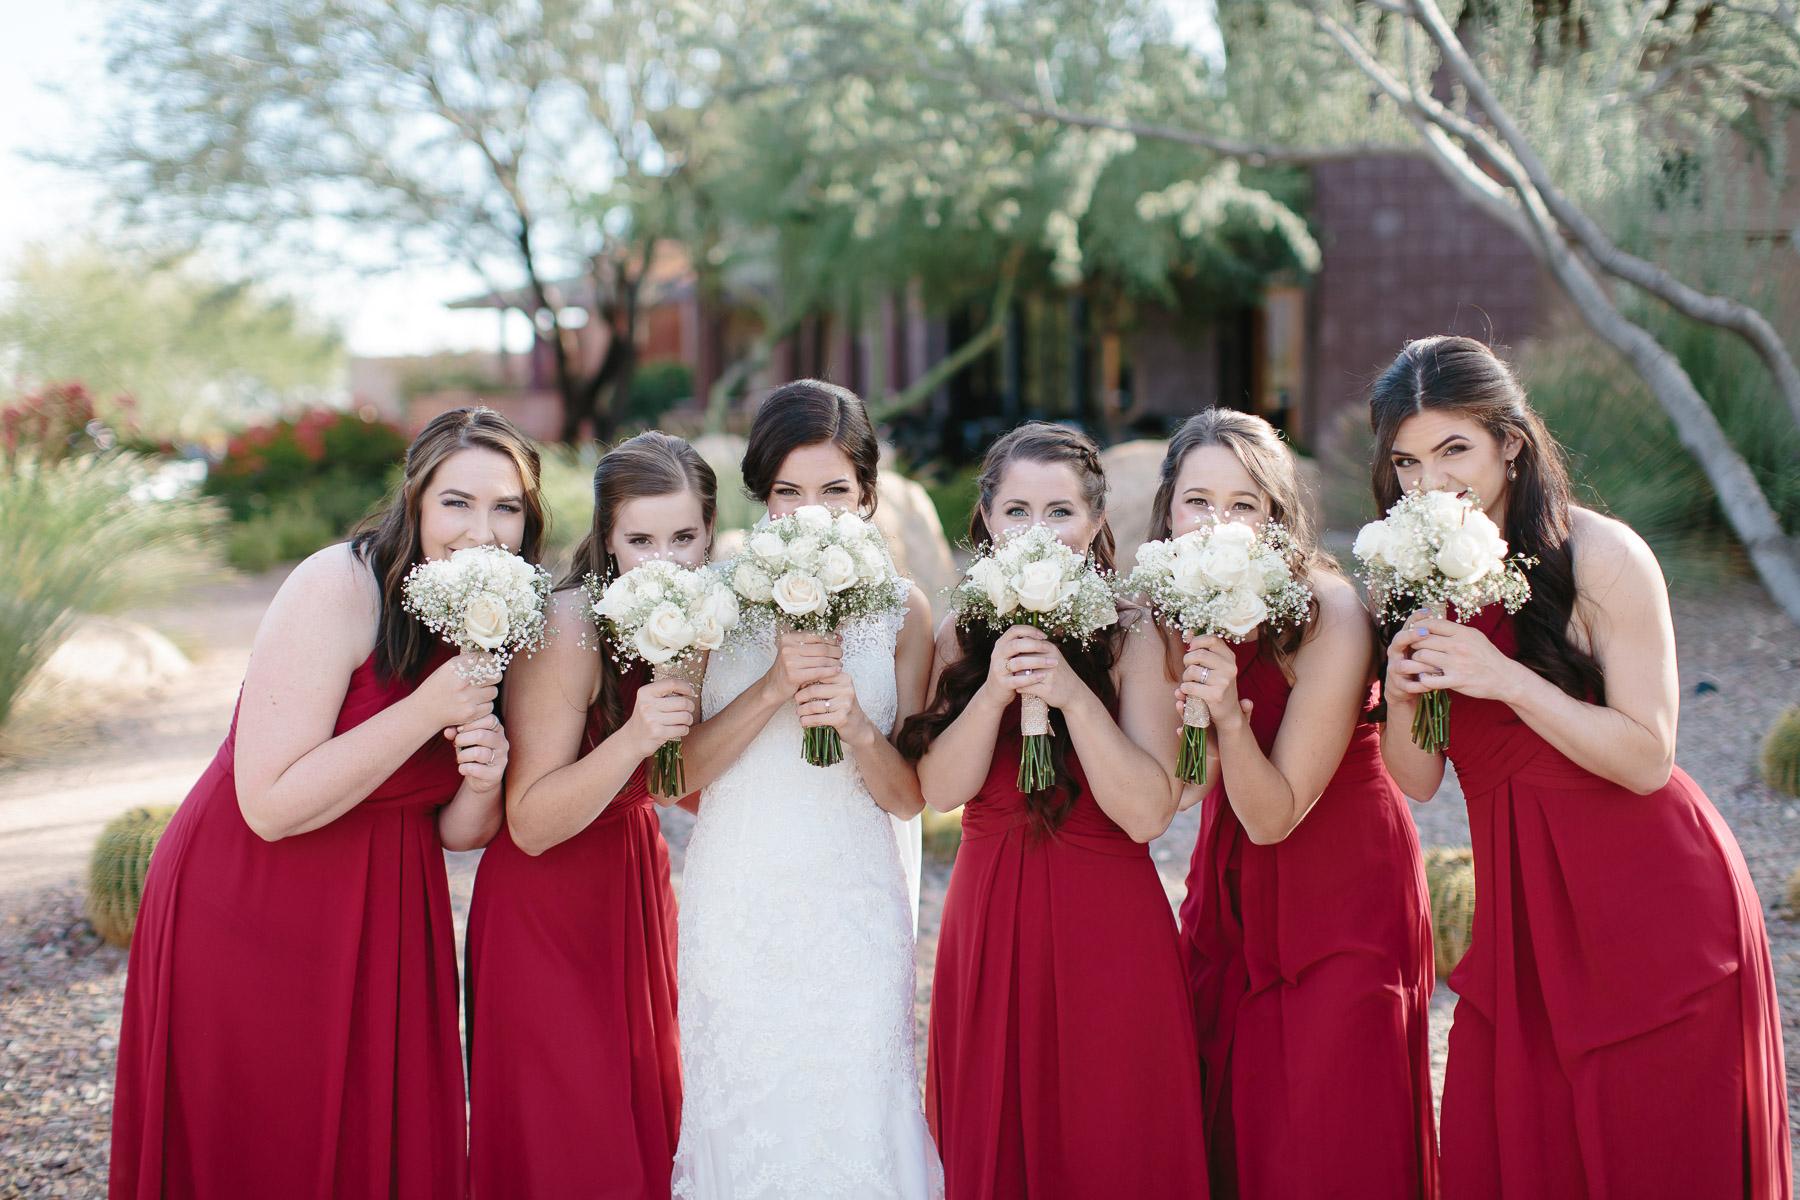 161210-Luxium-Weddings-Arizona-Matt-Jenny-Anthem-Golf-Country-Club-1014.jpg